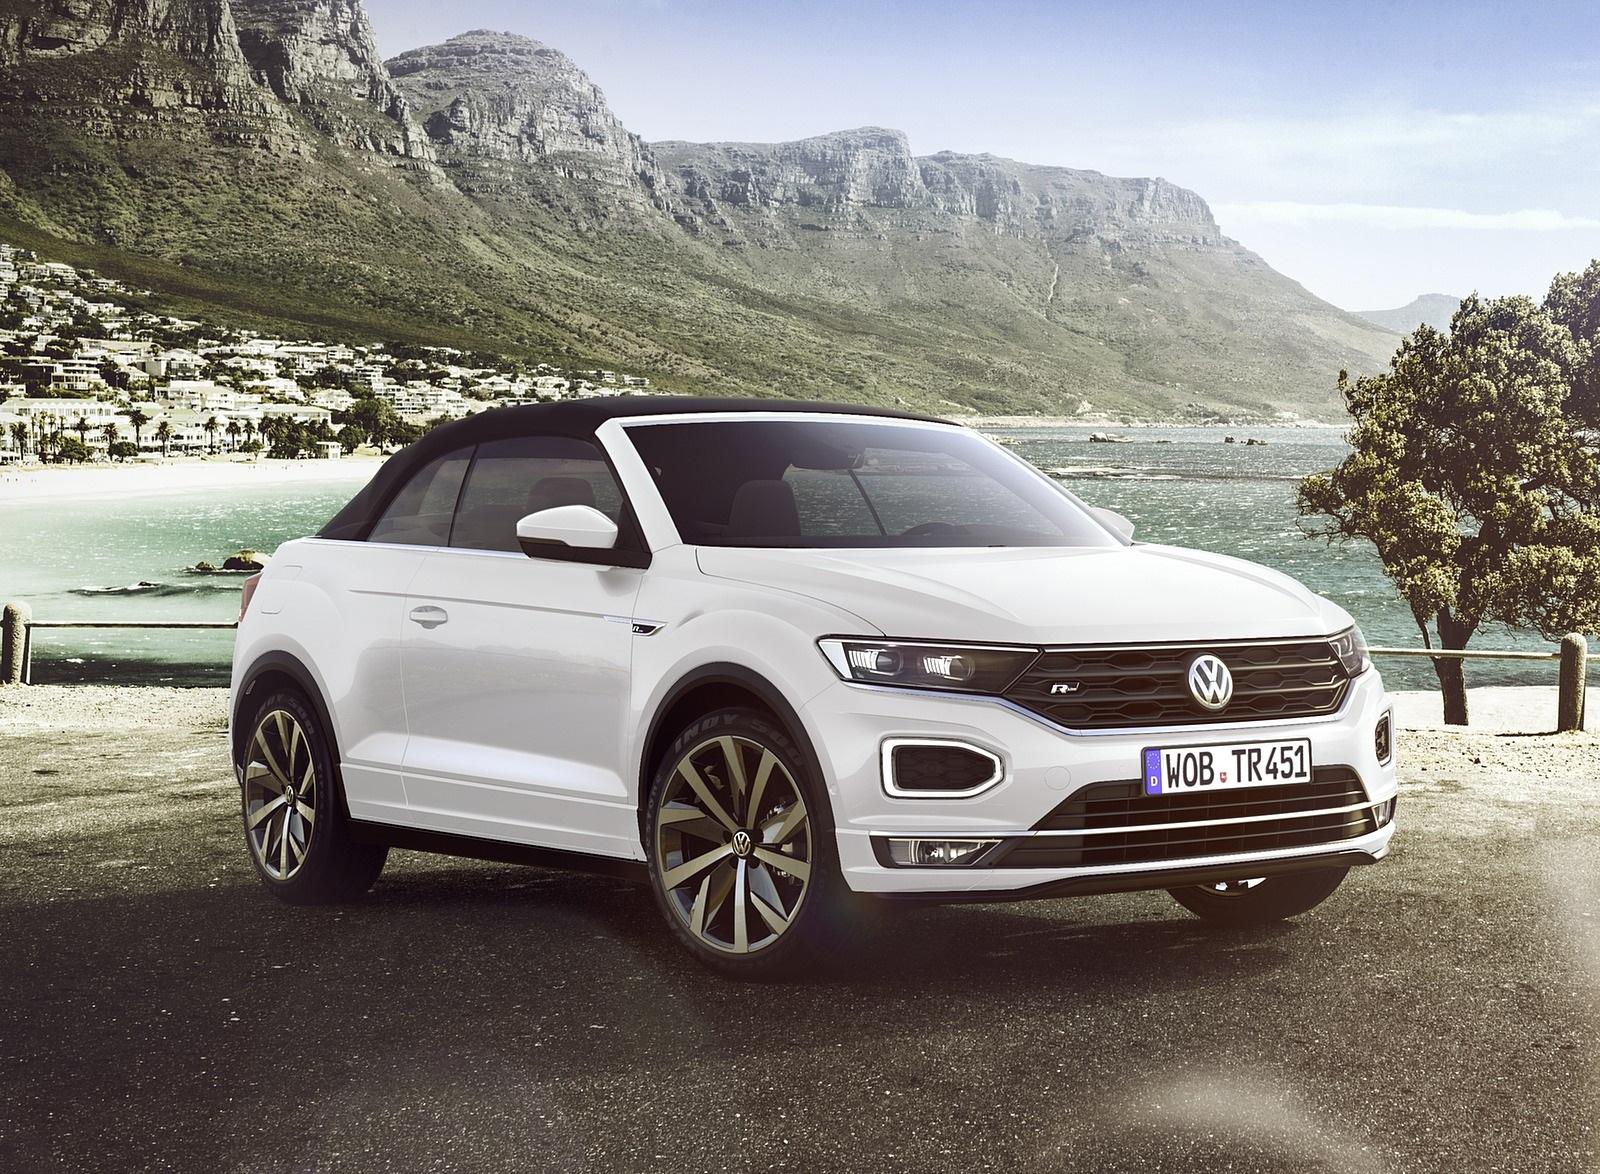 2020 Volkswagen T-Roc Cabriolet Front Three-Quarter Wallpapers (6)